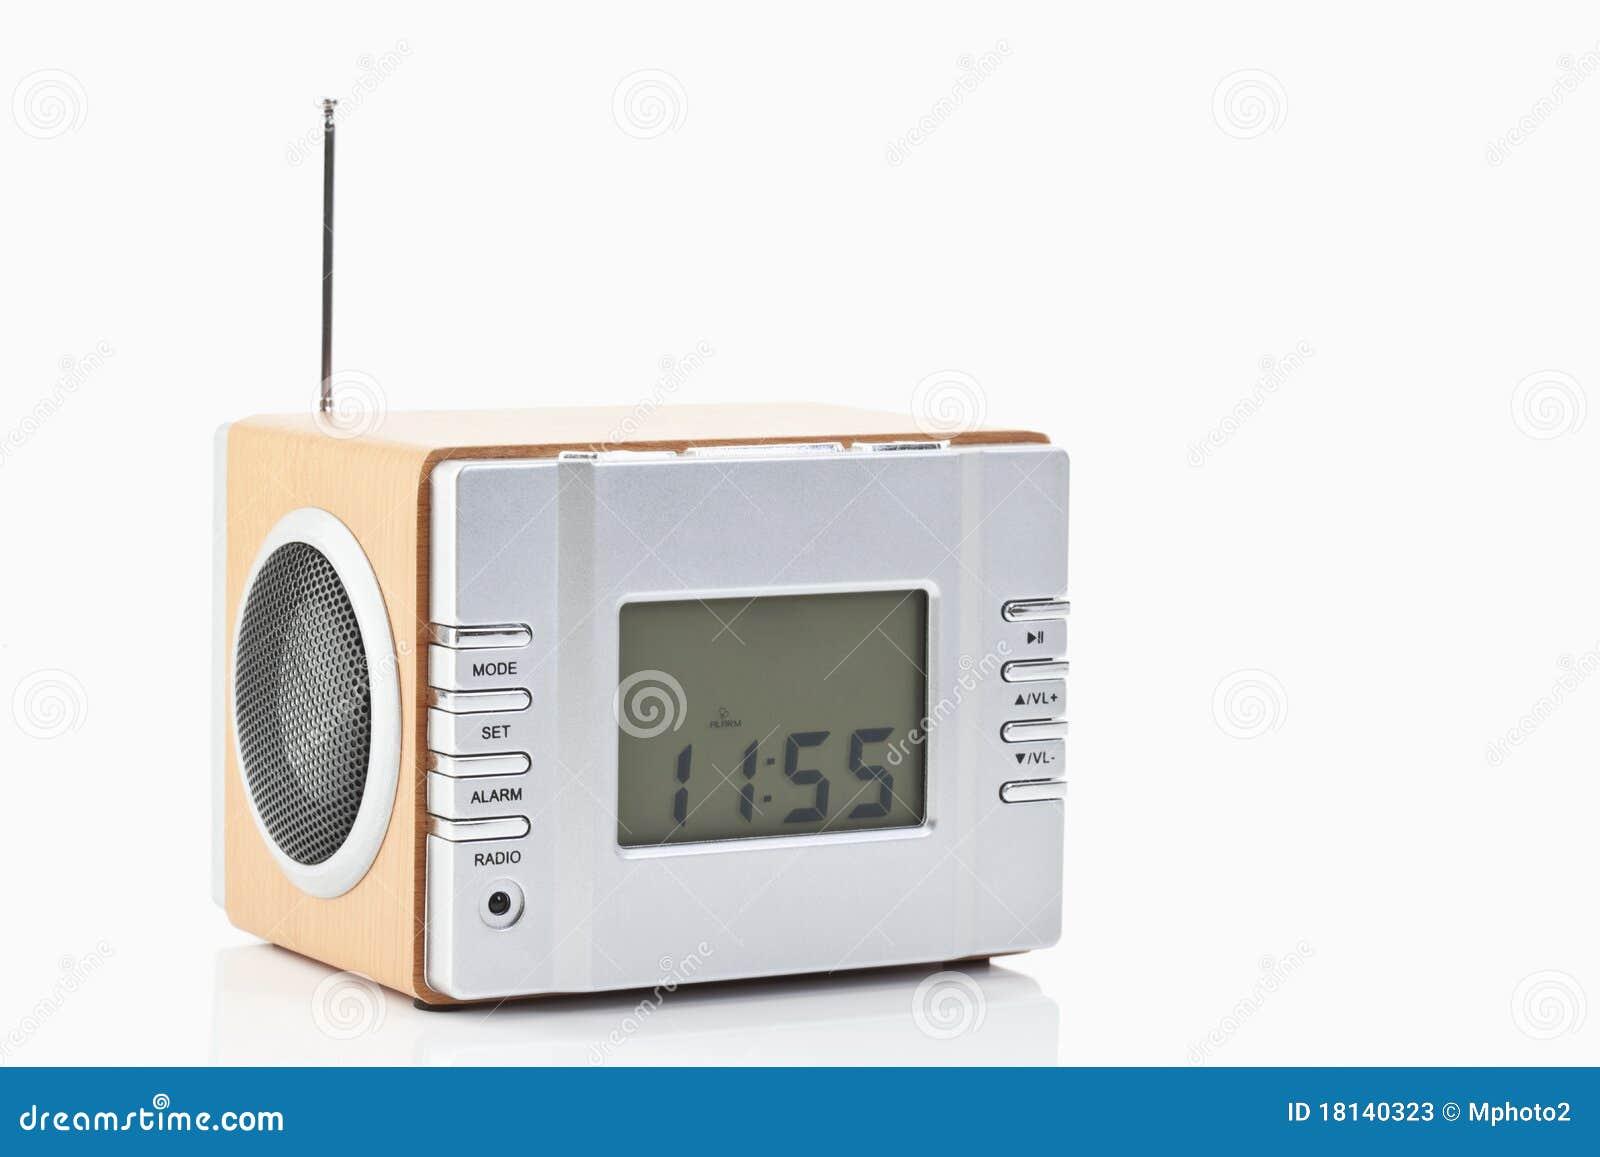 digital radio alarm clock stock photos image 18140323. Black Bedroom Furniture Sets. Home Design Ideas